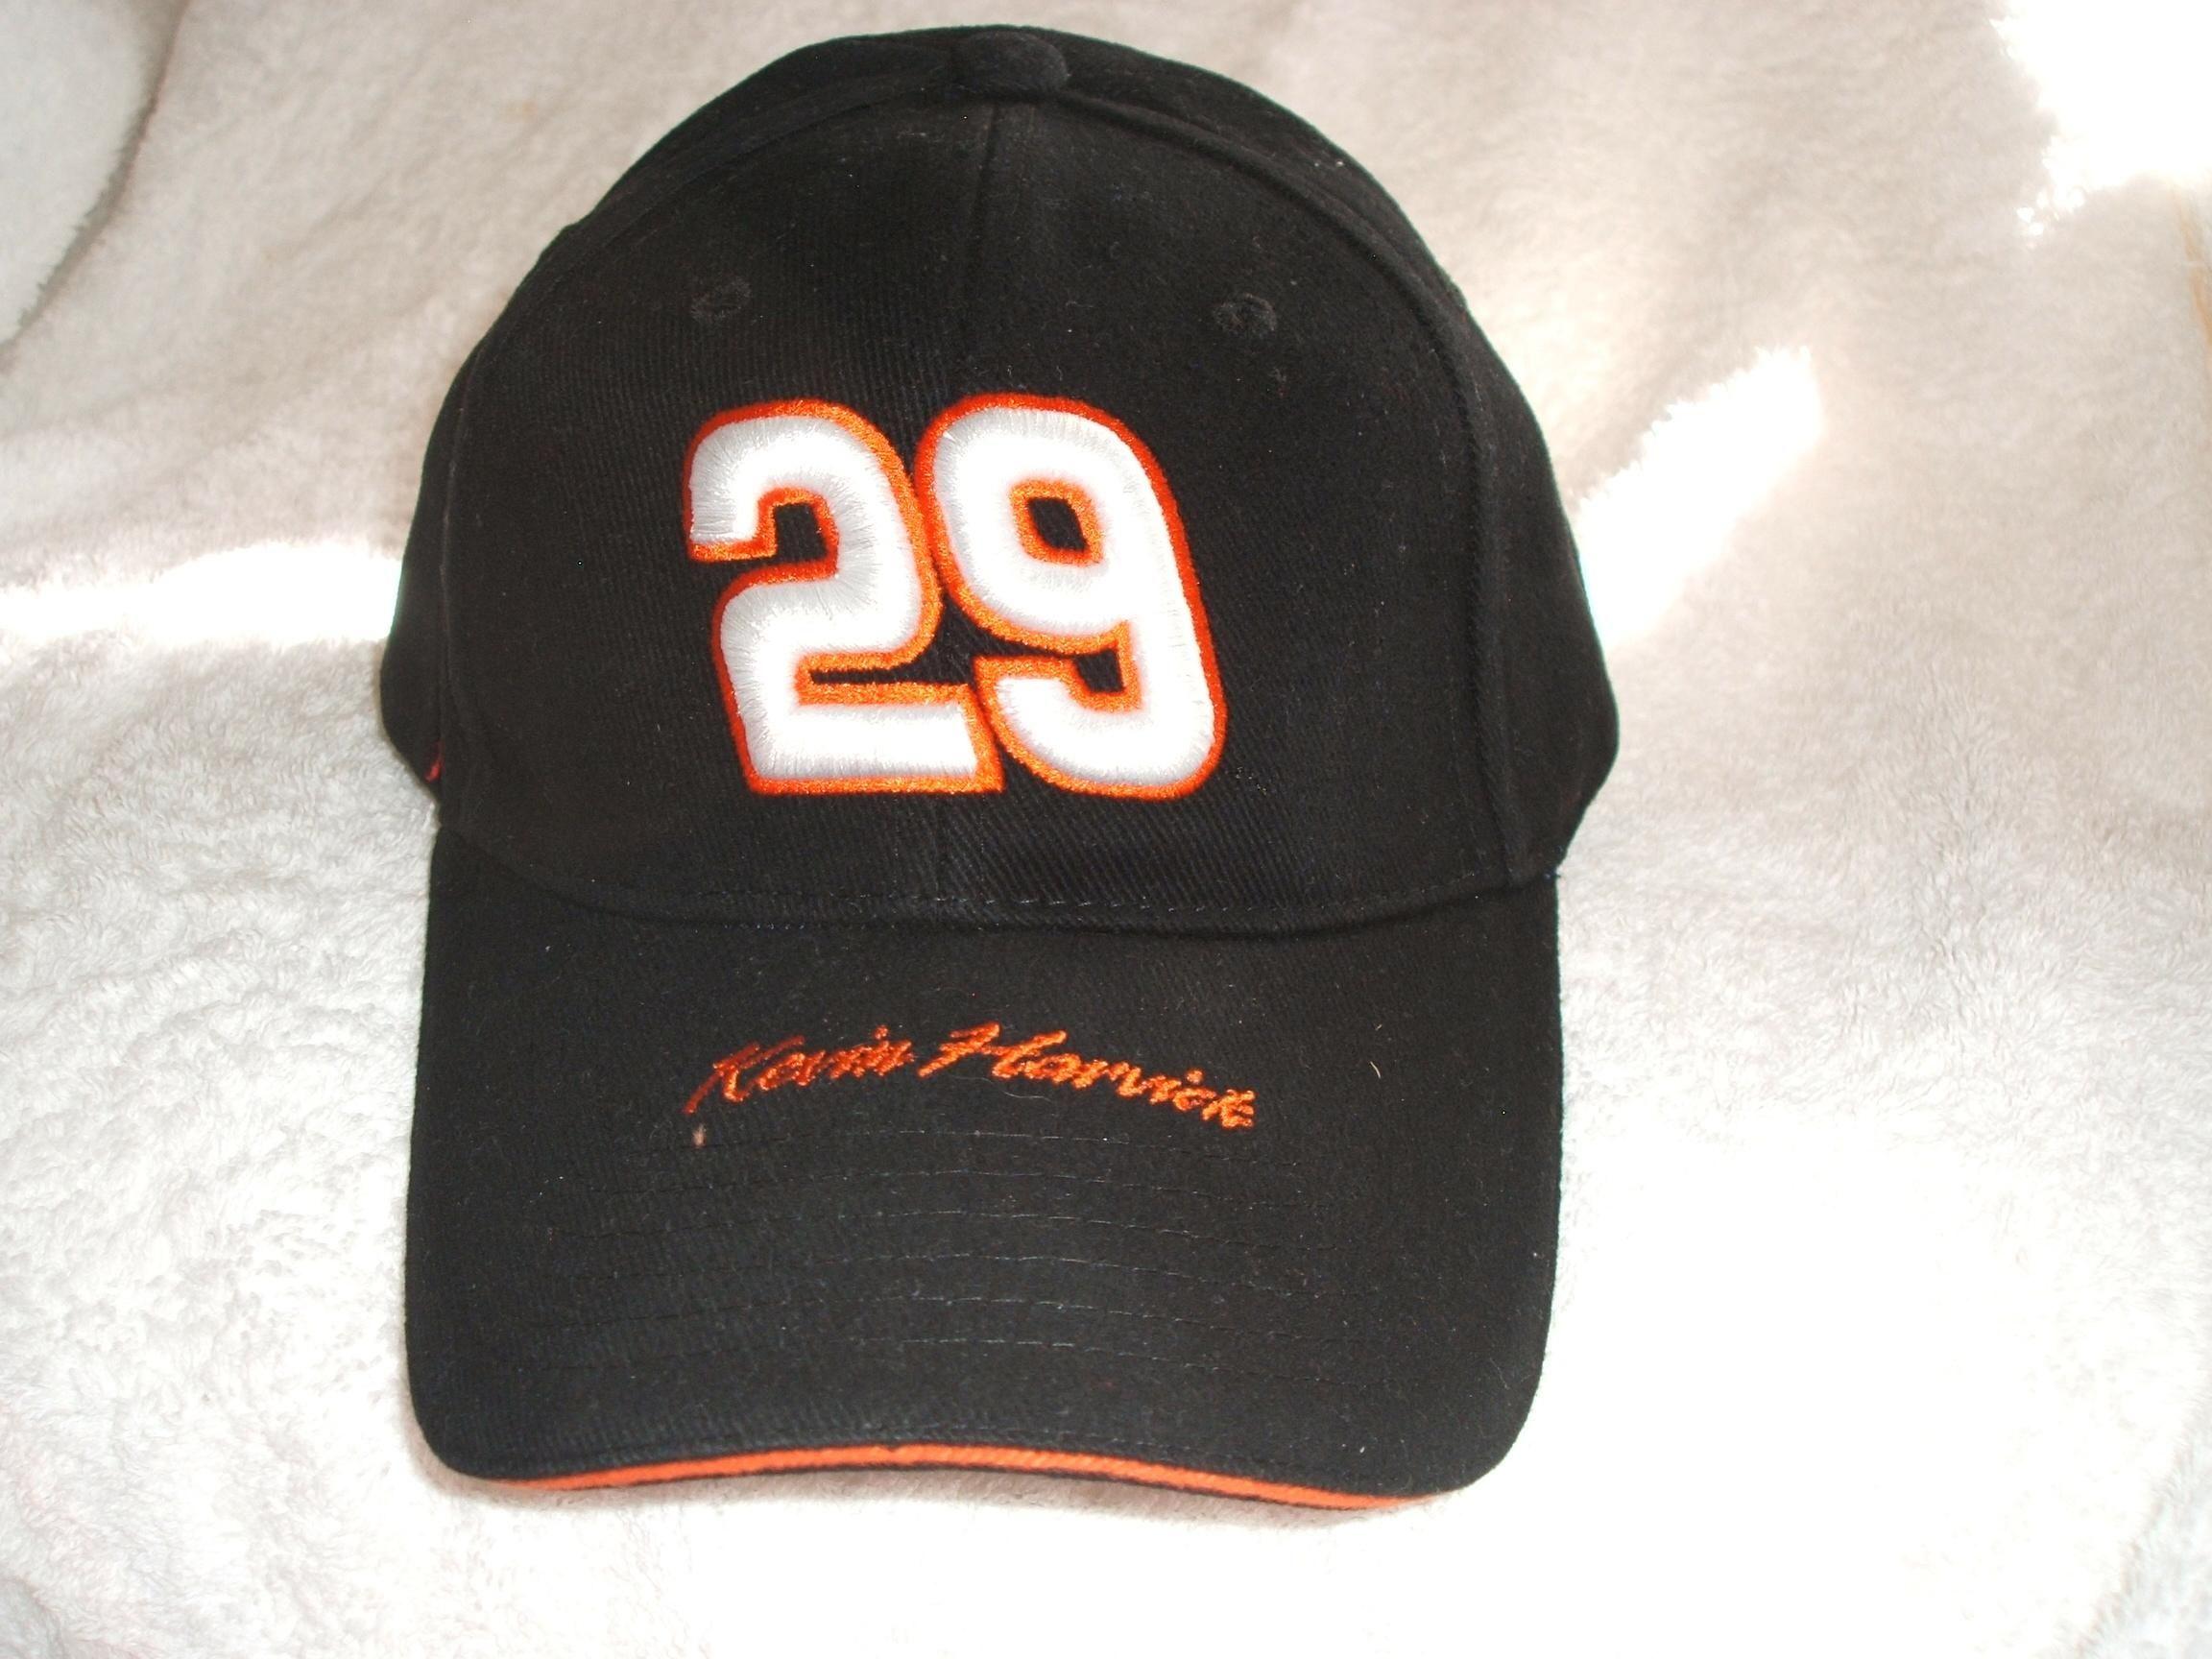 4e85c05c4 Kevin Harvick #29 Goodwrench Black new ball cap: Kevin Harvick, #29 ...